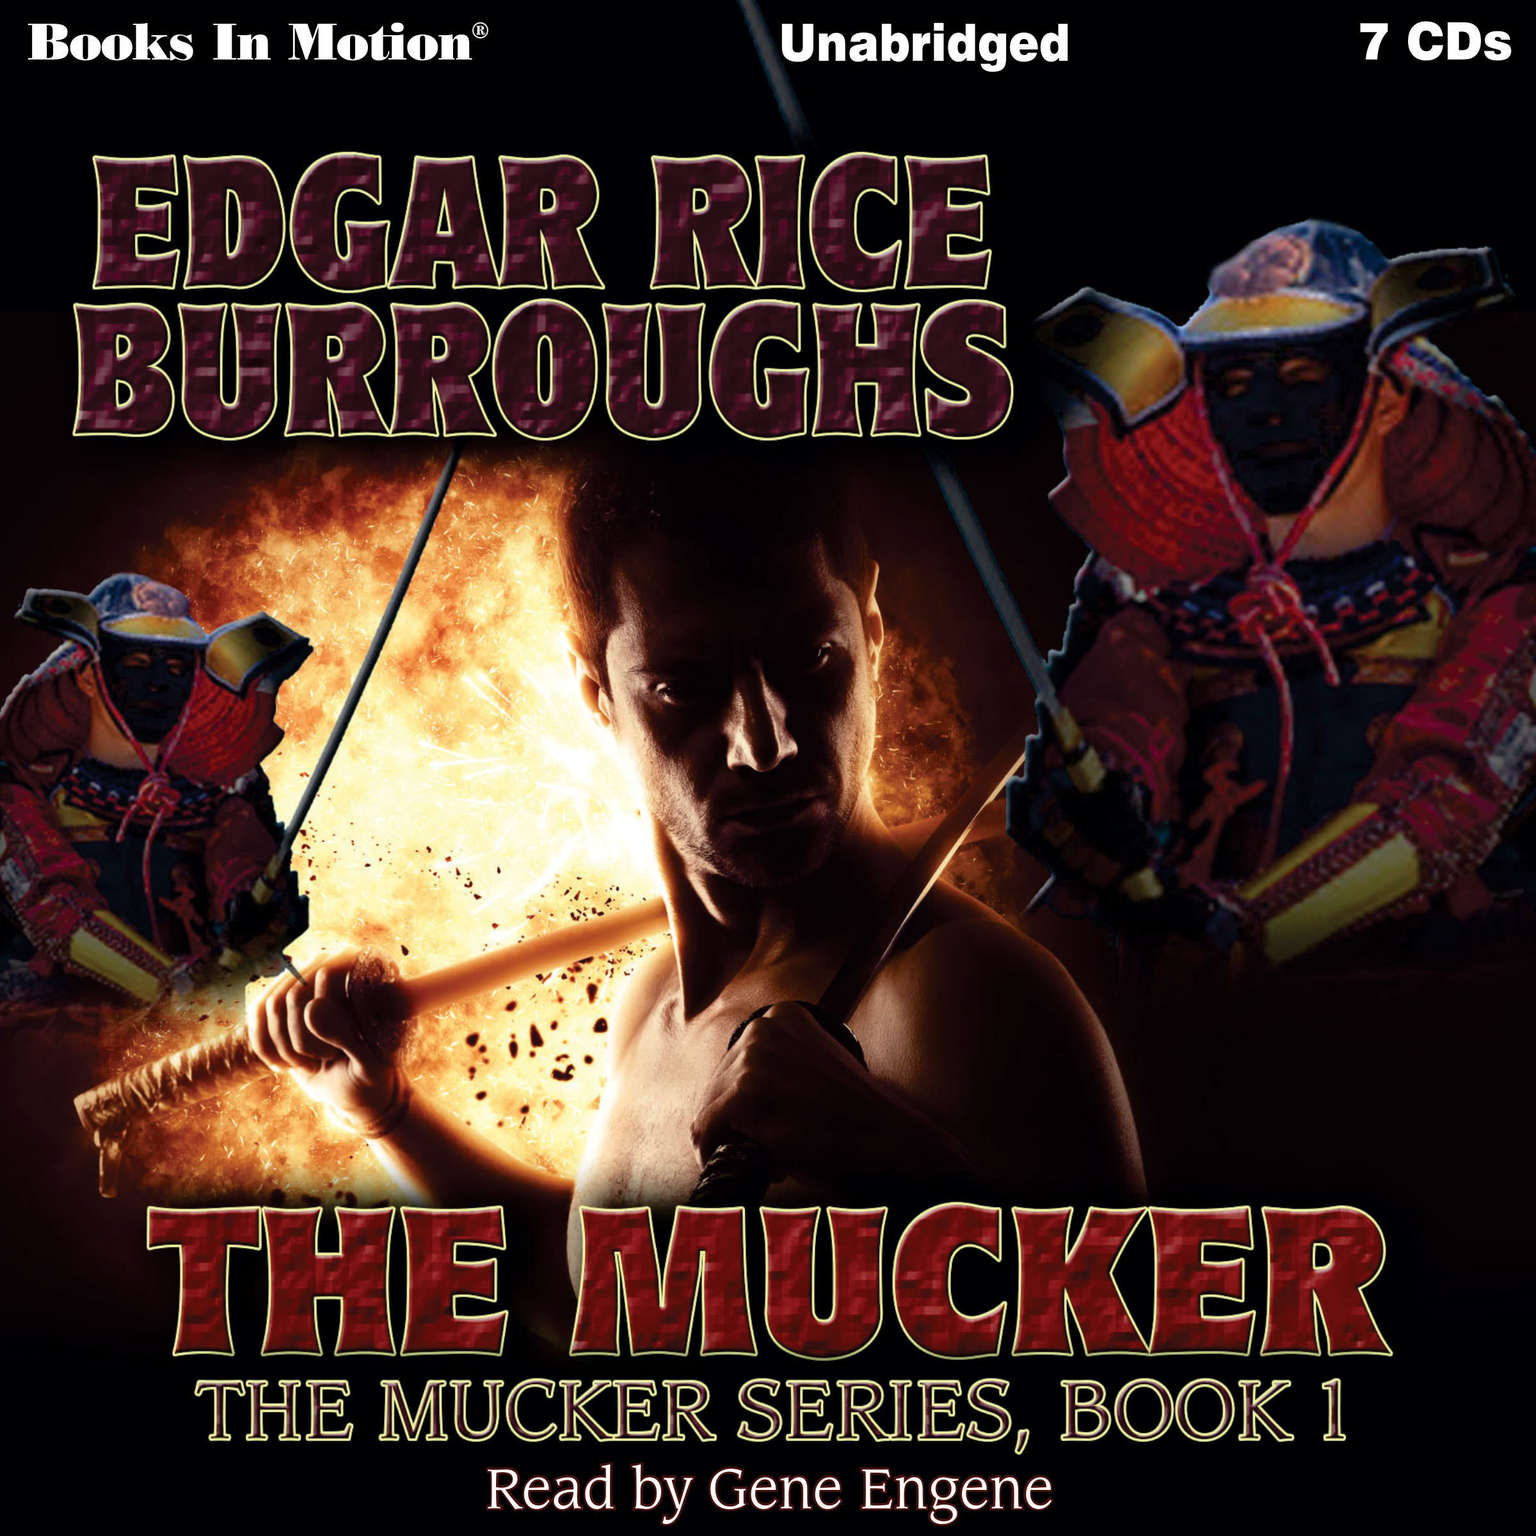 The Mucker: The Mucker Series, book 1 Audiobook, by Edgar Rice Burroughs